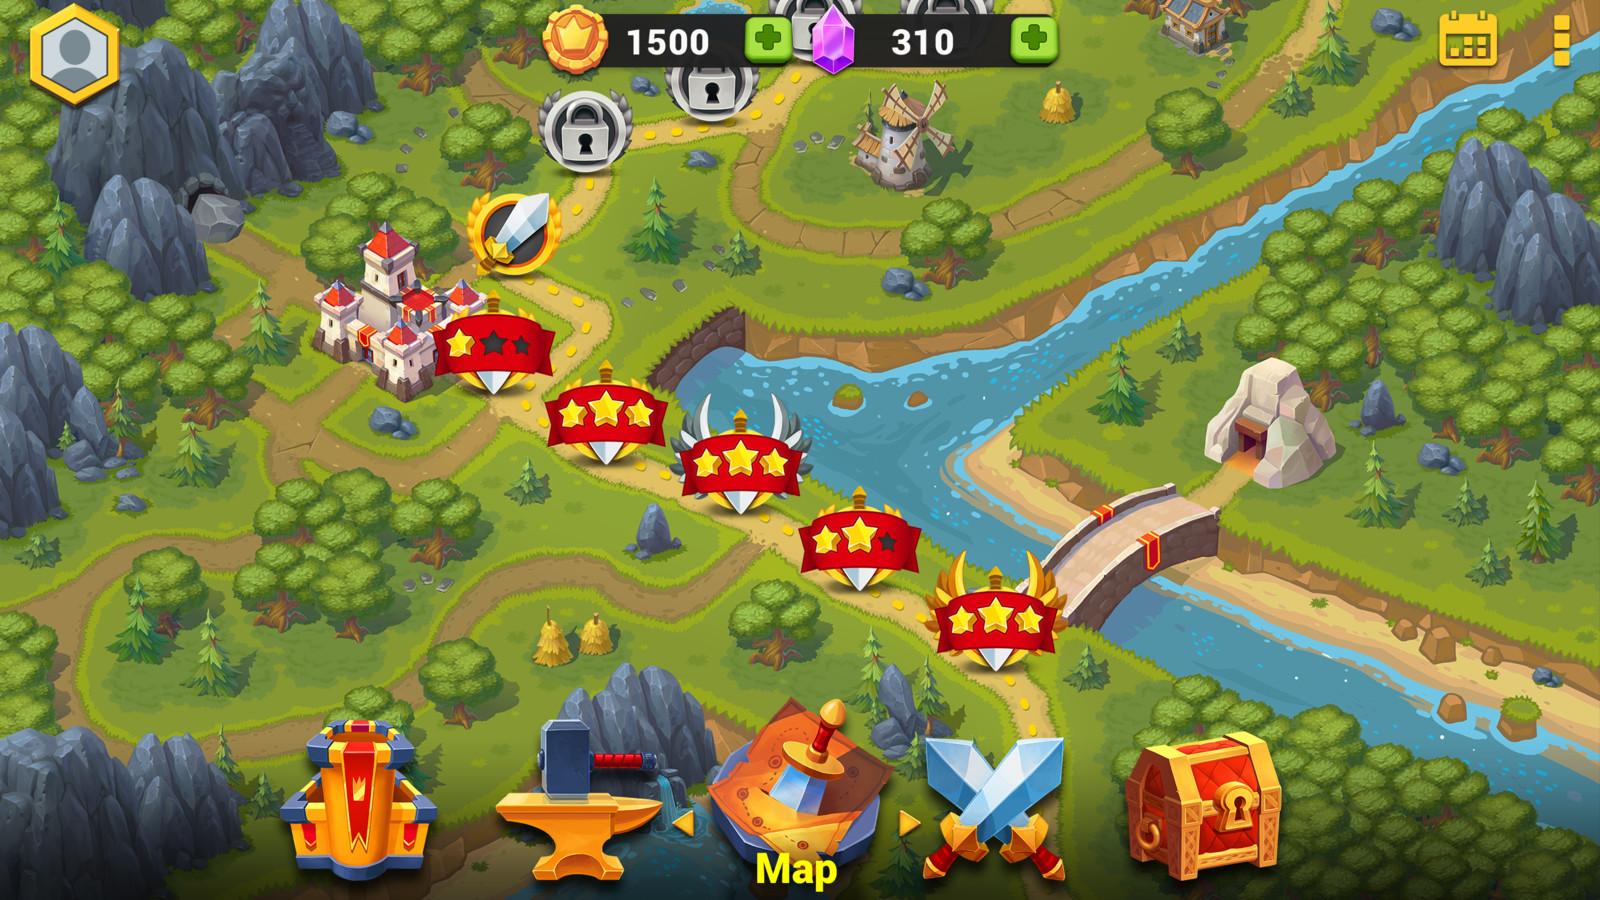 Map Screen